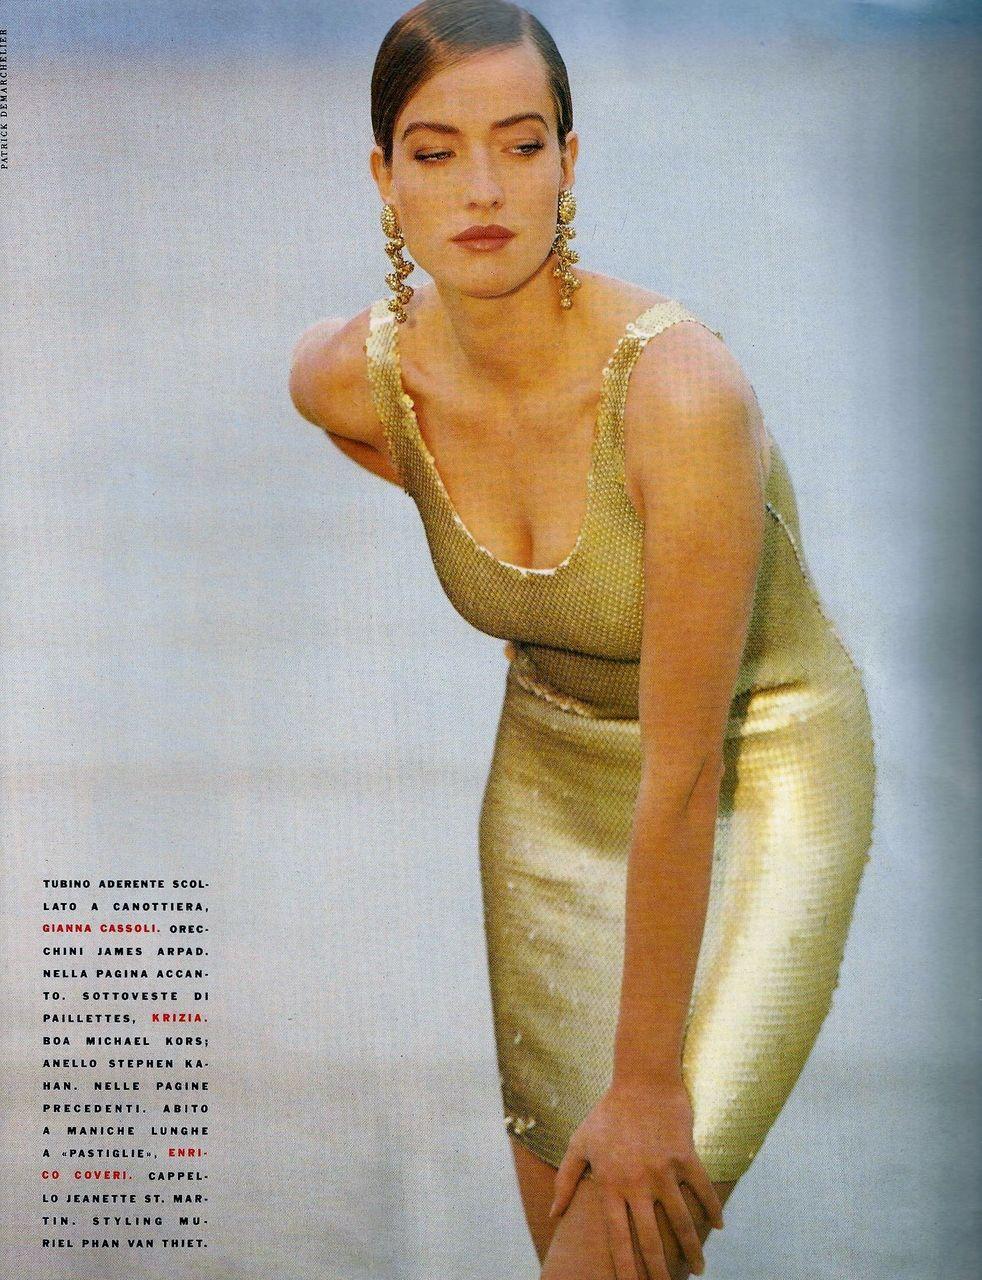 ☆ Tatjana Patitz | Photography by Patrick Demarchelier | For Vogue Magazine Italy | July 1990 ☆ #Tatjana_Patitz #Patrick_Demarchelier #Vogue #1990